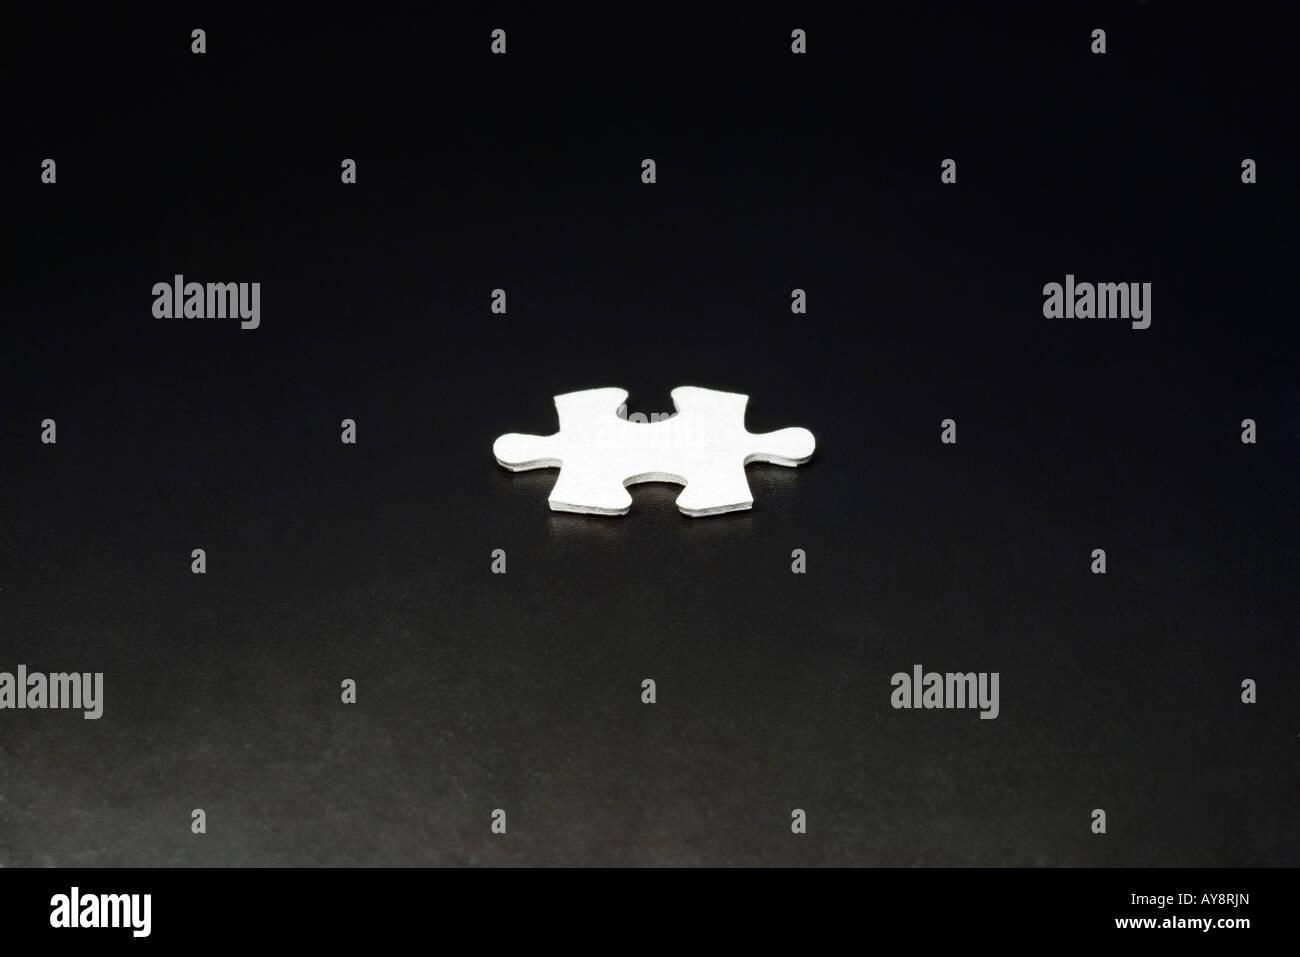 Jigsaw puzzle piece, close-up - Stock Image